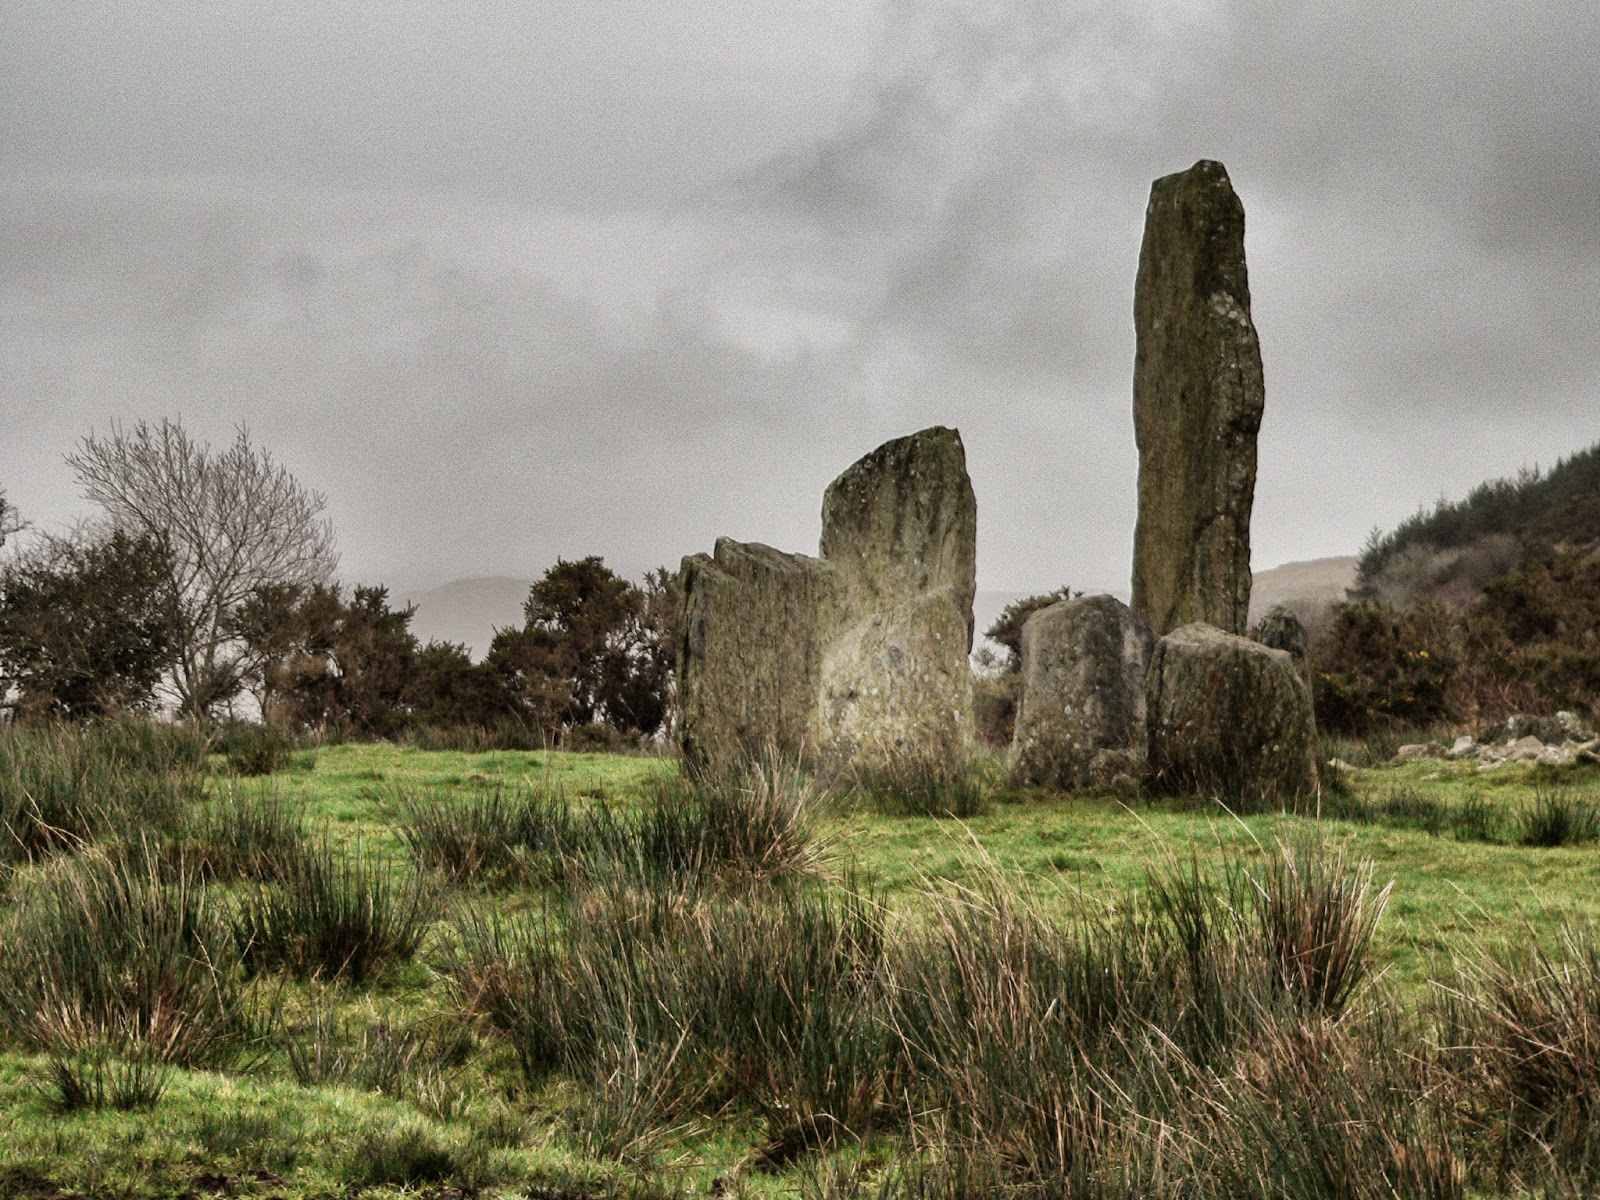 places thin sacred earth ireland mystical stone circle irish place county cork energies rain spring matters stones feis workshops language